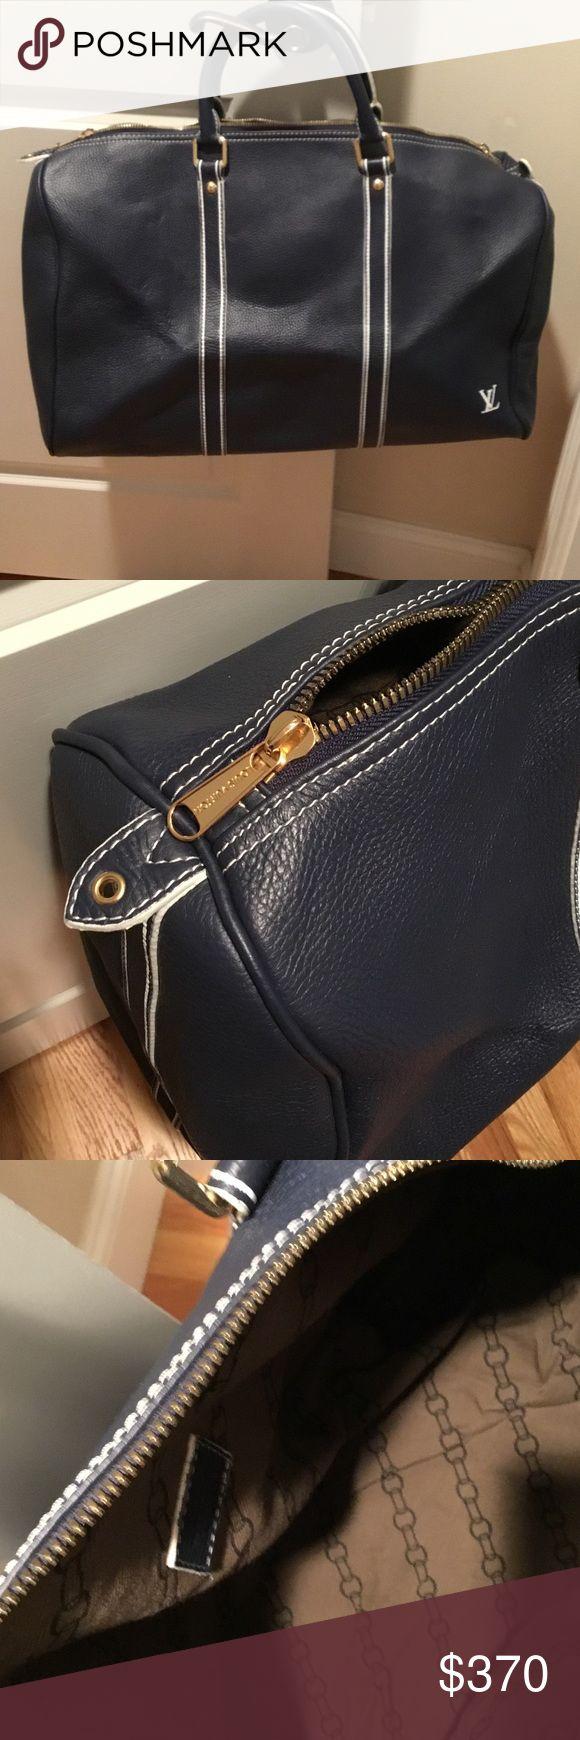 Authentic Louis Vuitton keepall 55 handbag Keepall 55 Navy Authentic Louis Vuitton good condition Louis Vuitton Bags Travel Bags